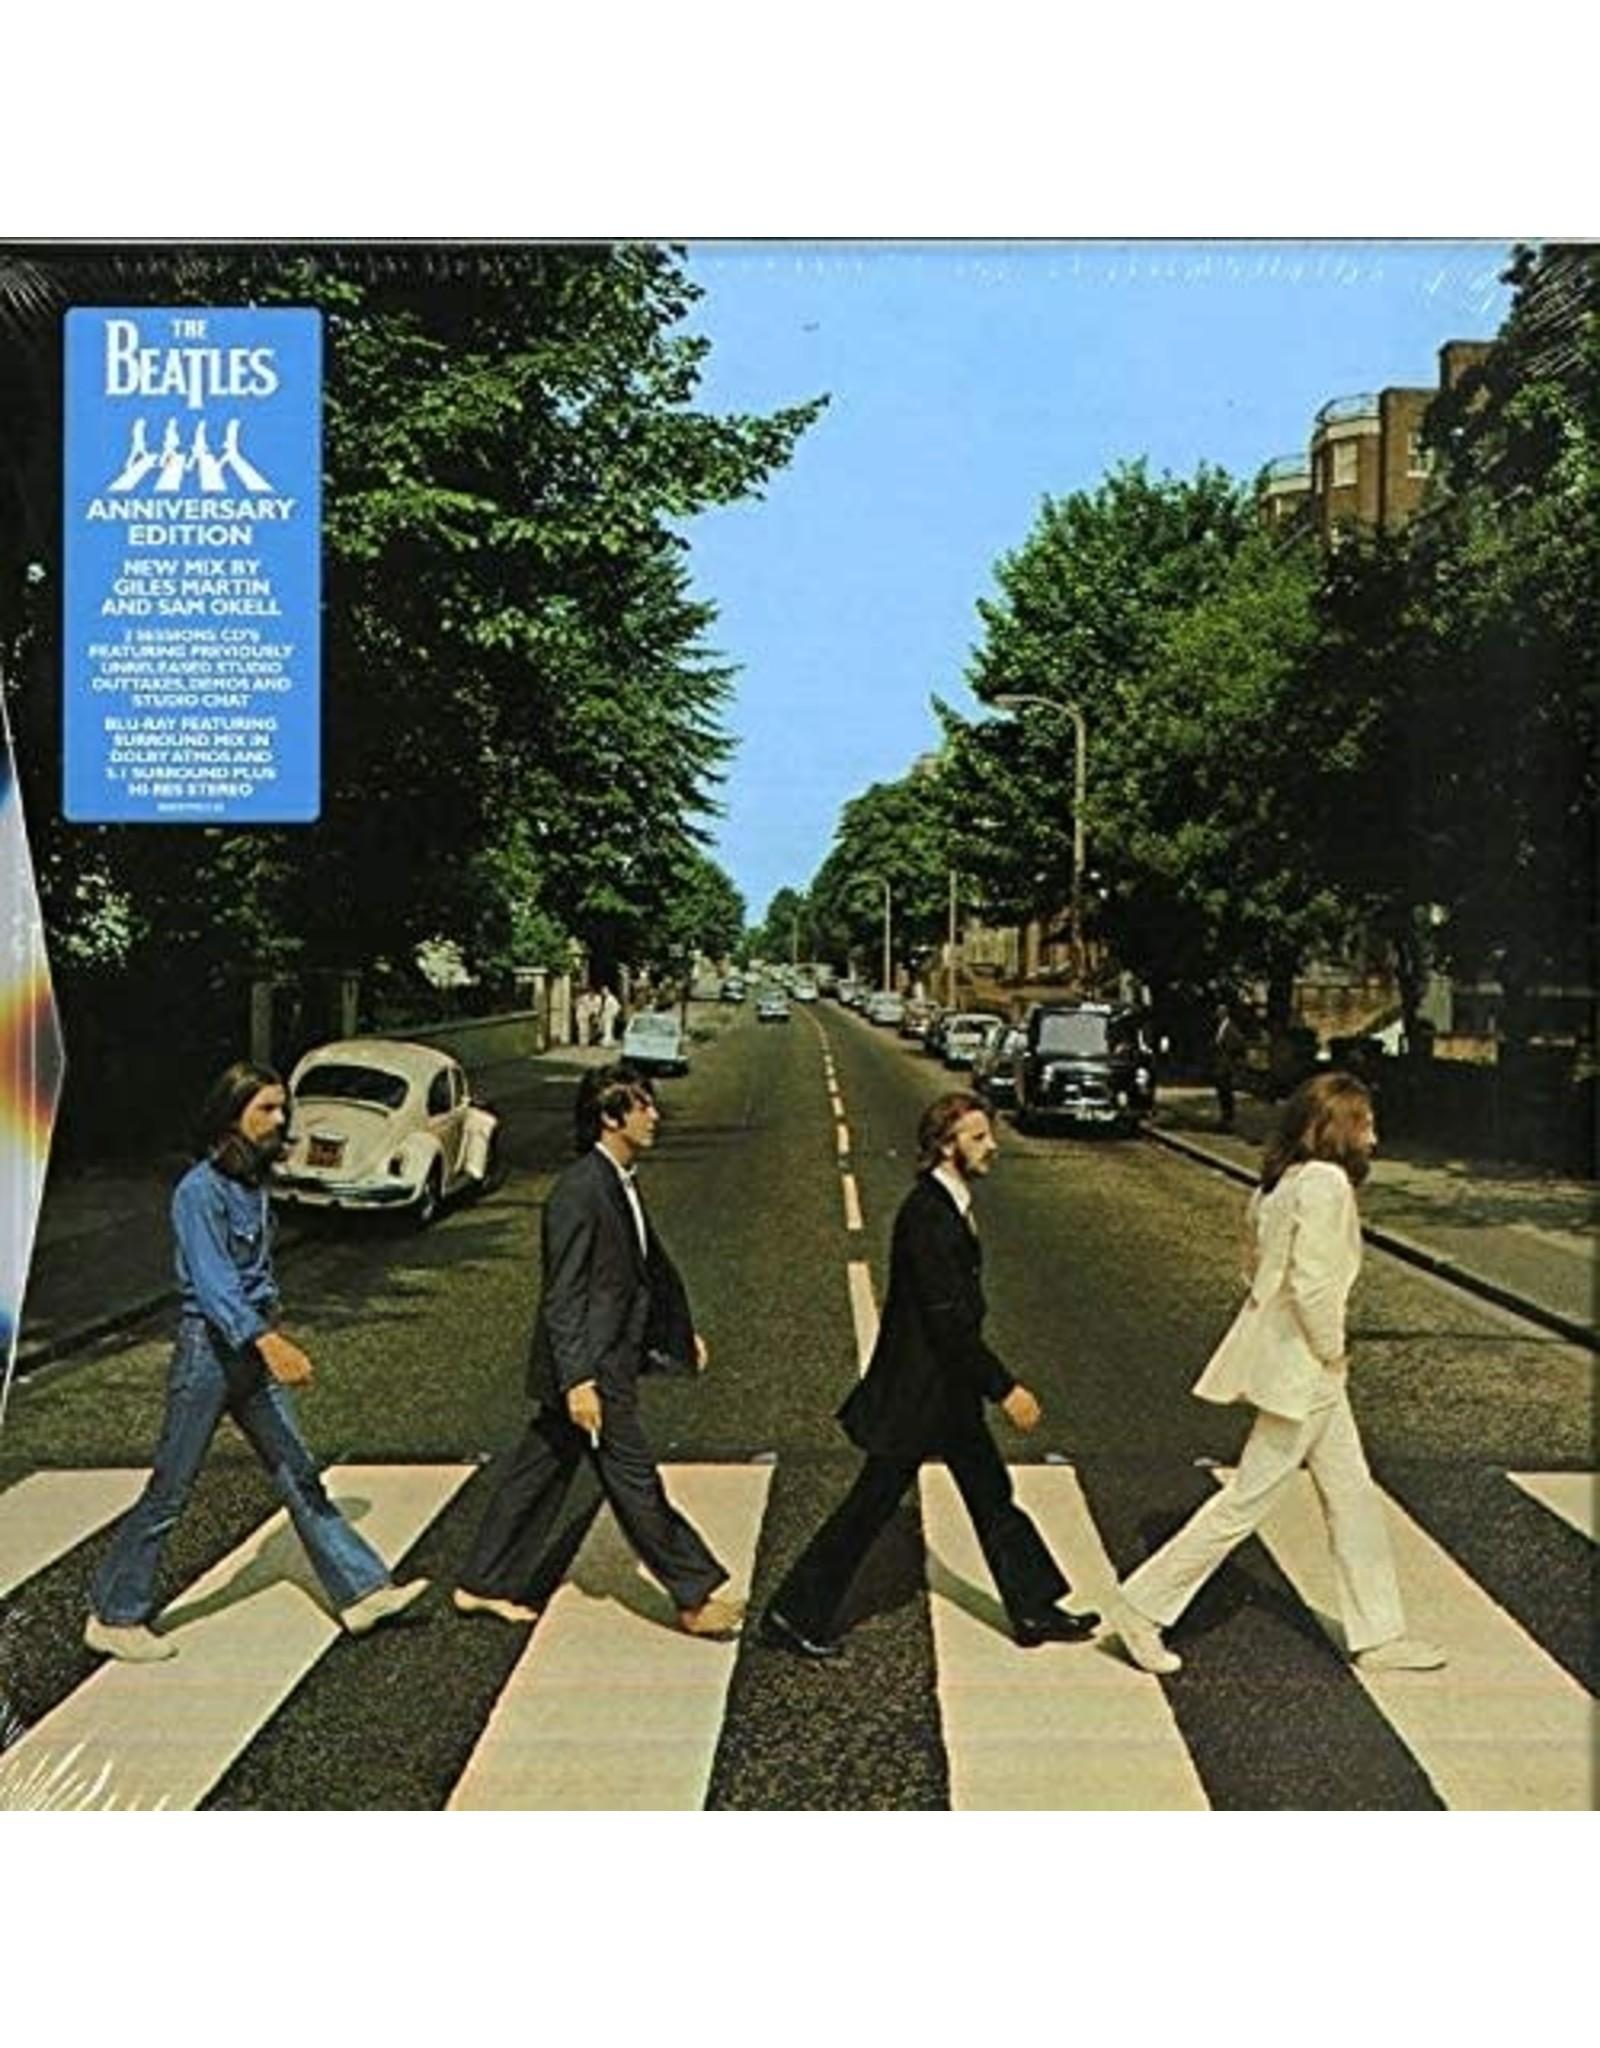 Beatles - Abbey Road 50th Anniversary CD Box Set